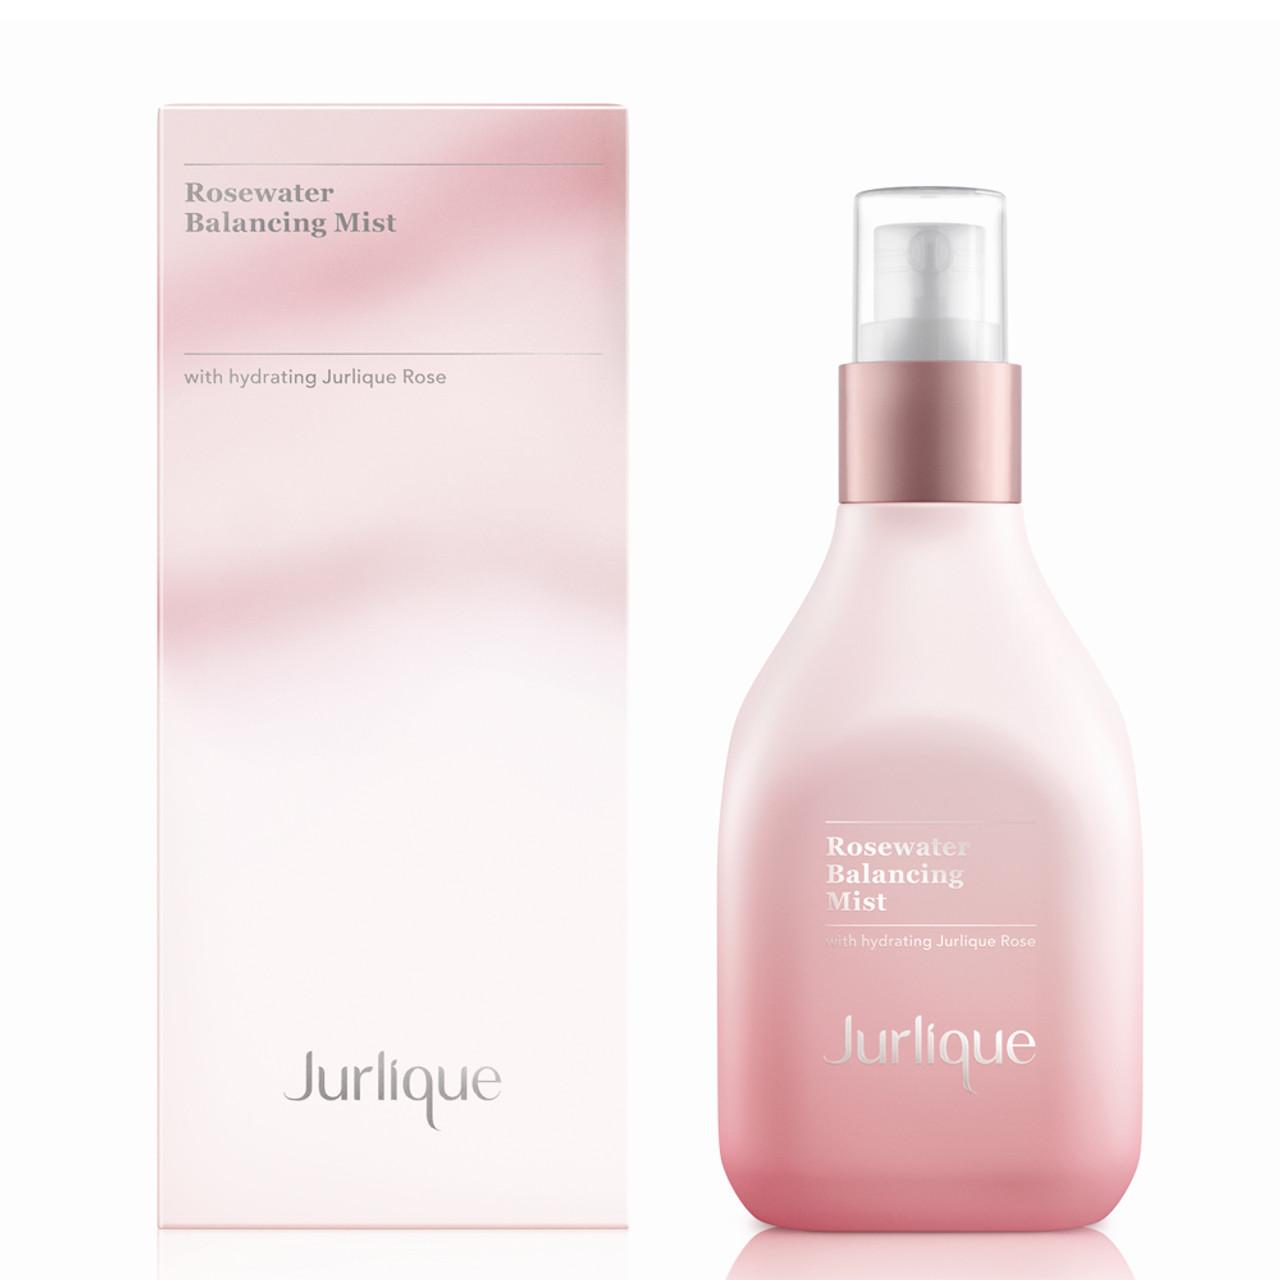 Jurlique Rosewater Balancing Mist BeautifiedYou.com